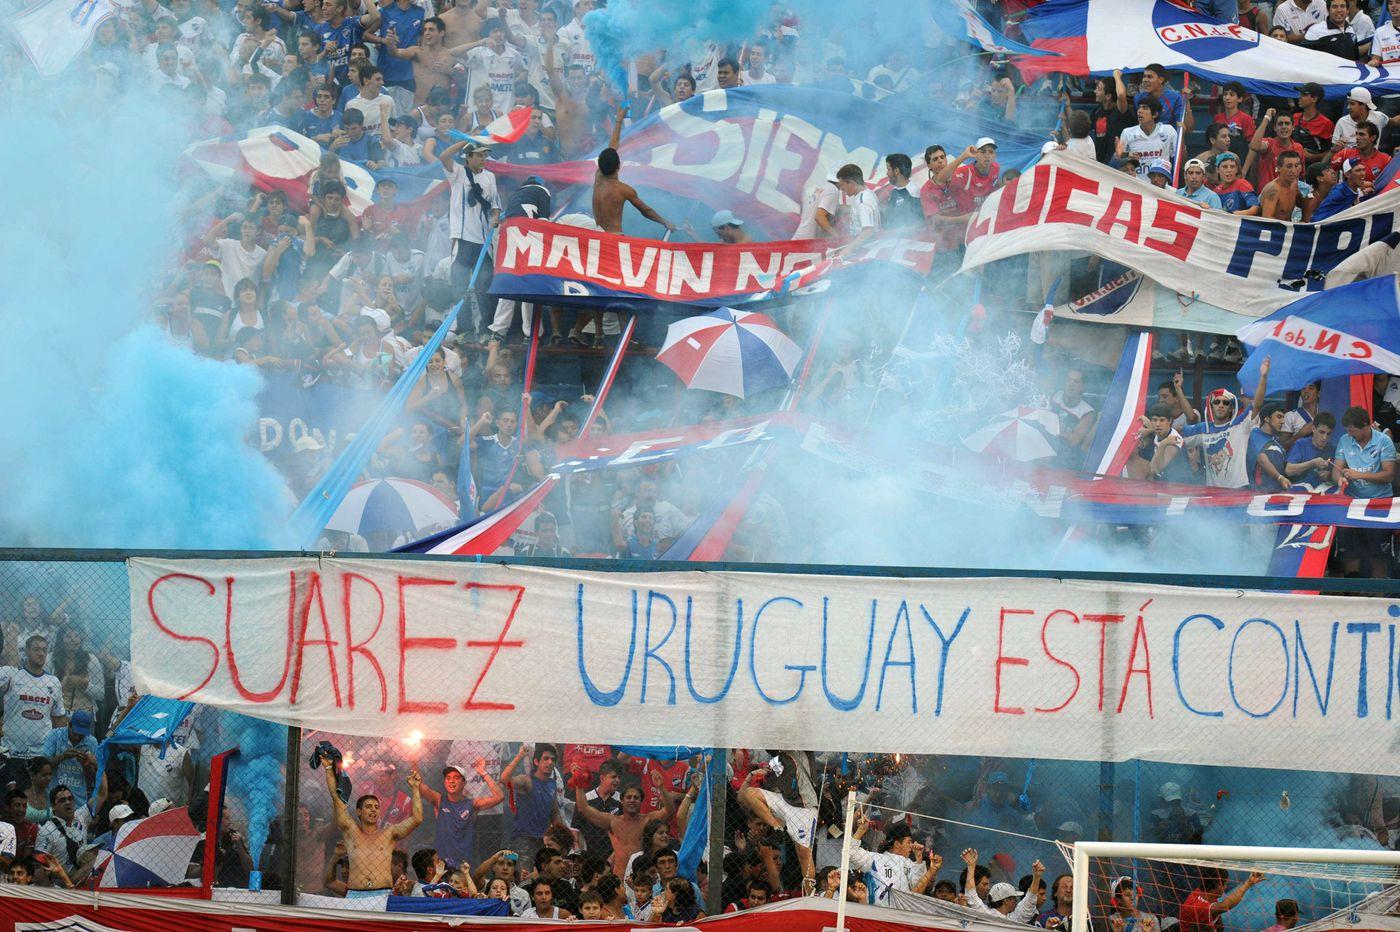 A sociology professor explains why soccer struggles to address racism